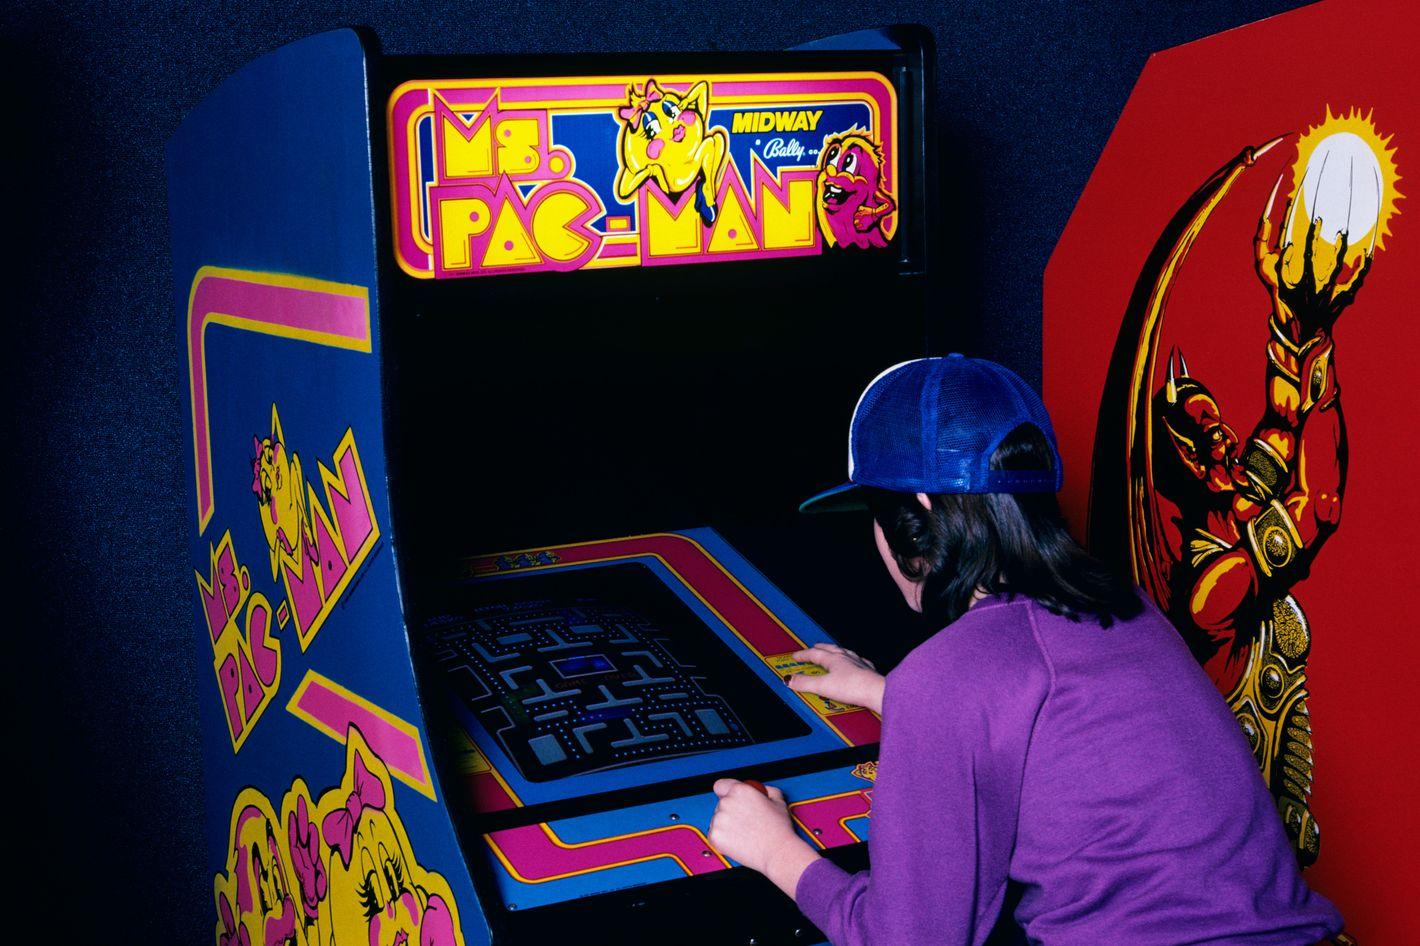 Teen Girl Wear Baseball Cap Playing Ms. Pac Man Video Game In Arcade